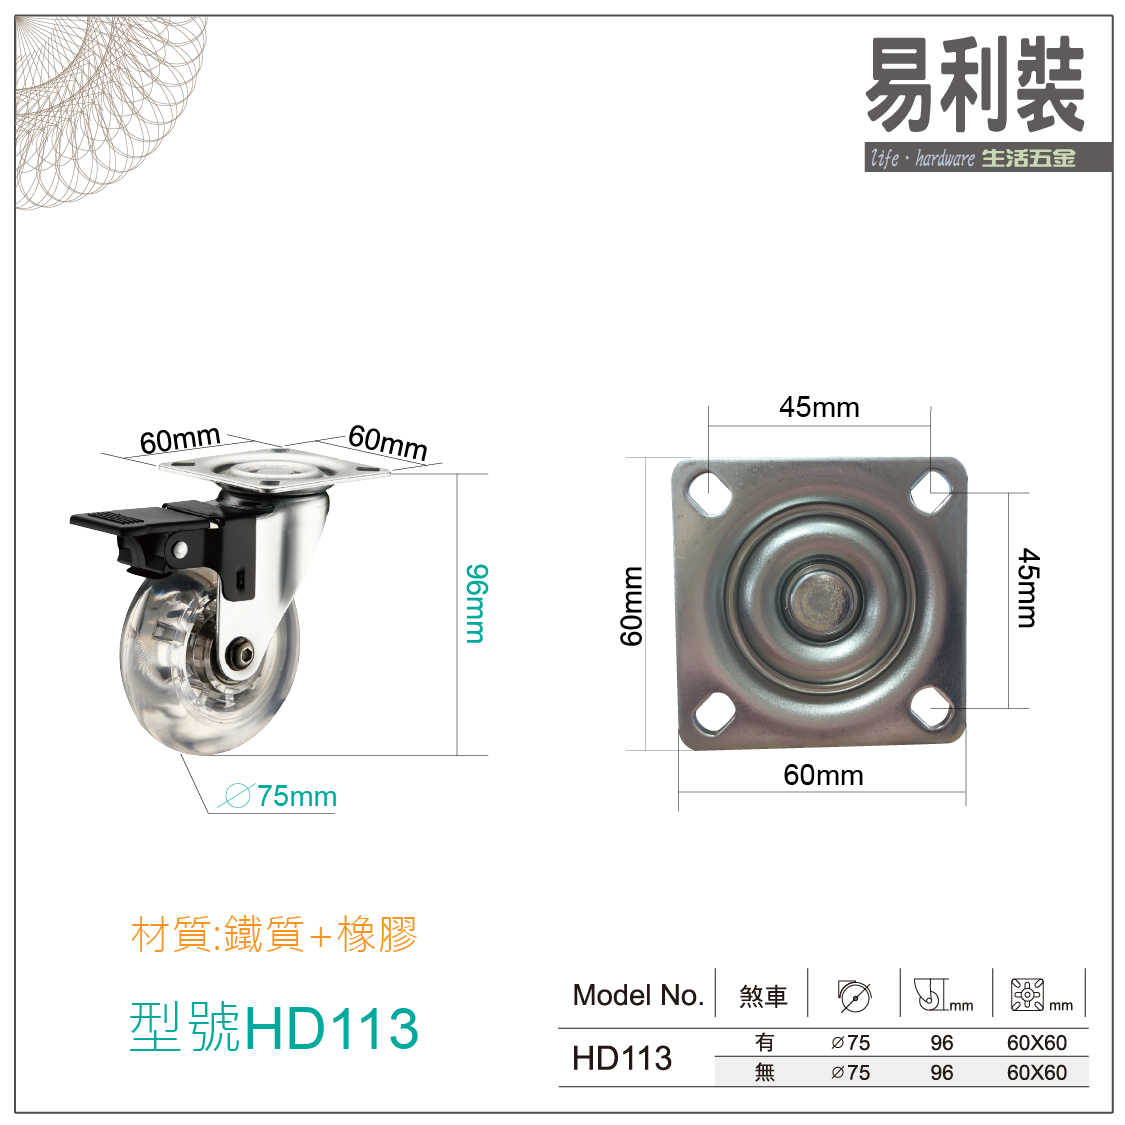 【 EASYCAN  】HD112-113 活動輪 易利裝生活五金 桌輪 櫃輪 房間 臥房 衣櫃 小資族 辦公家具 系統家具 3